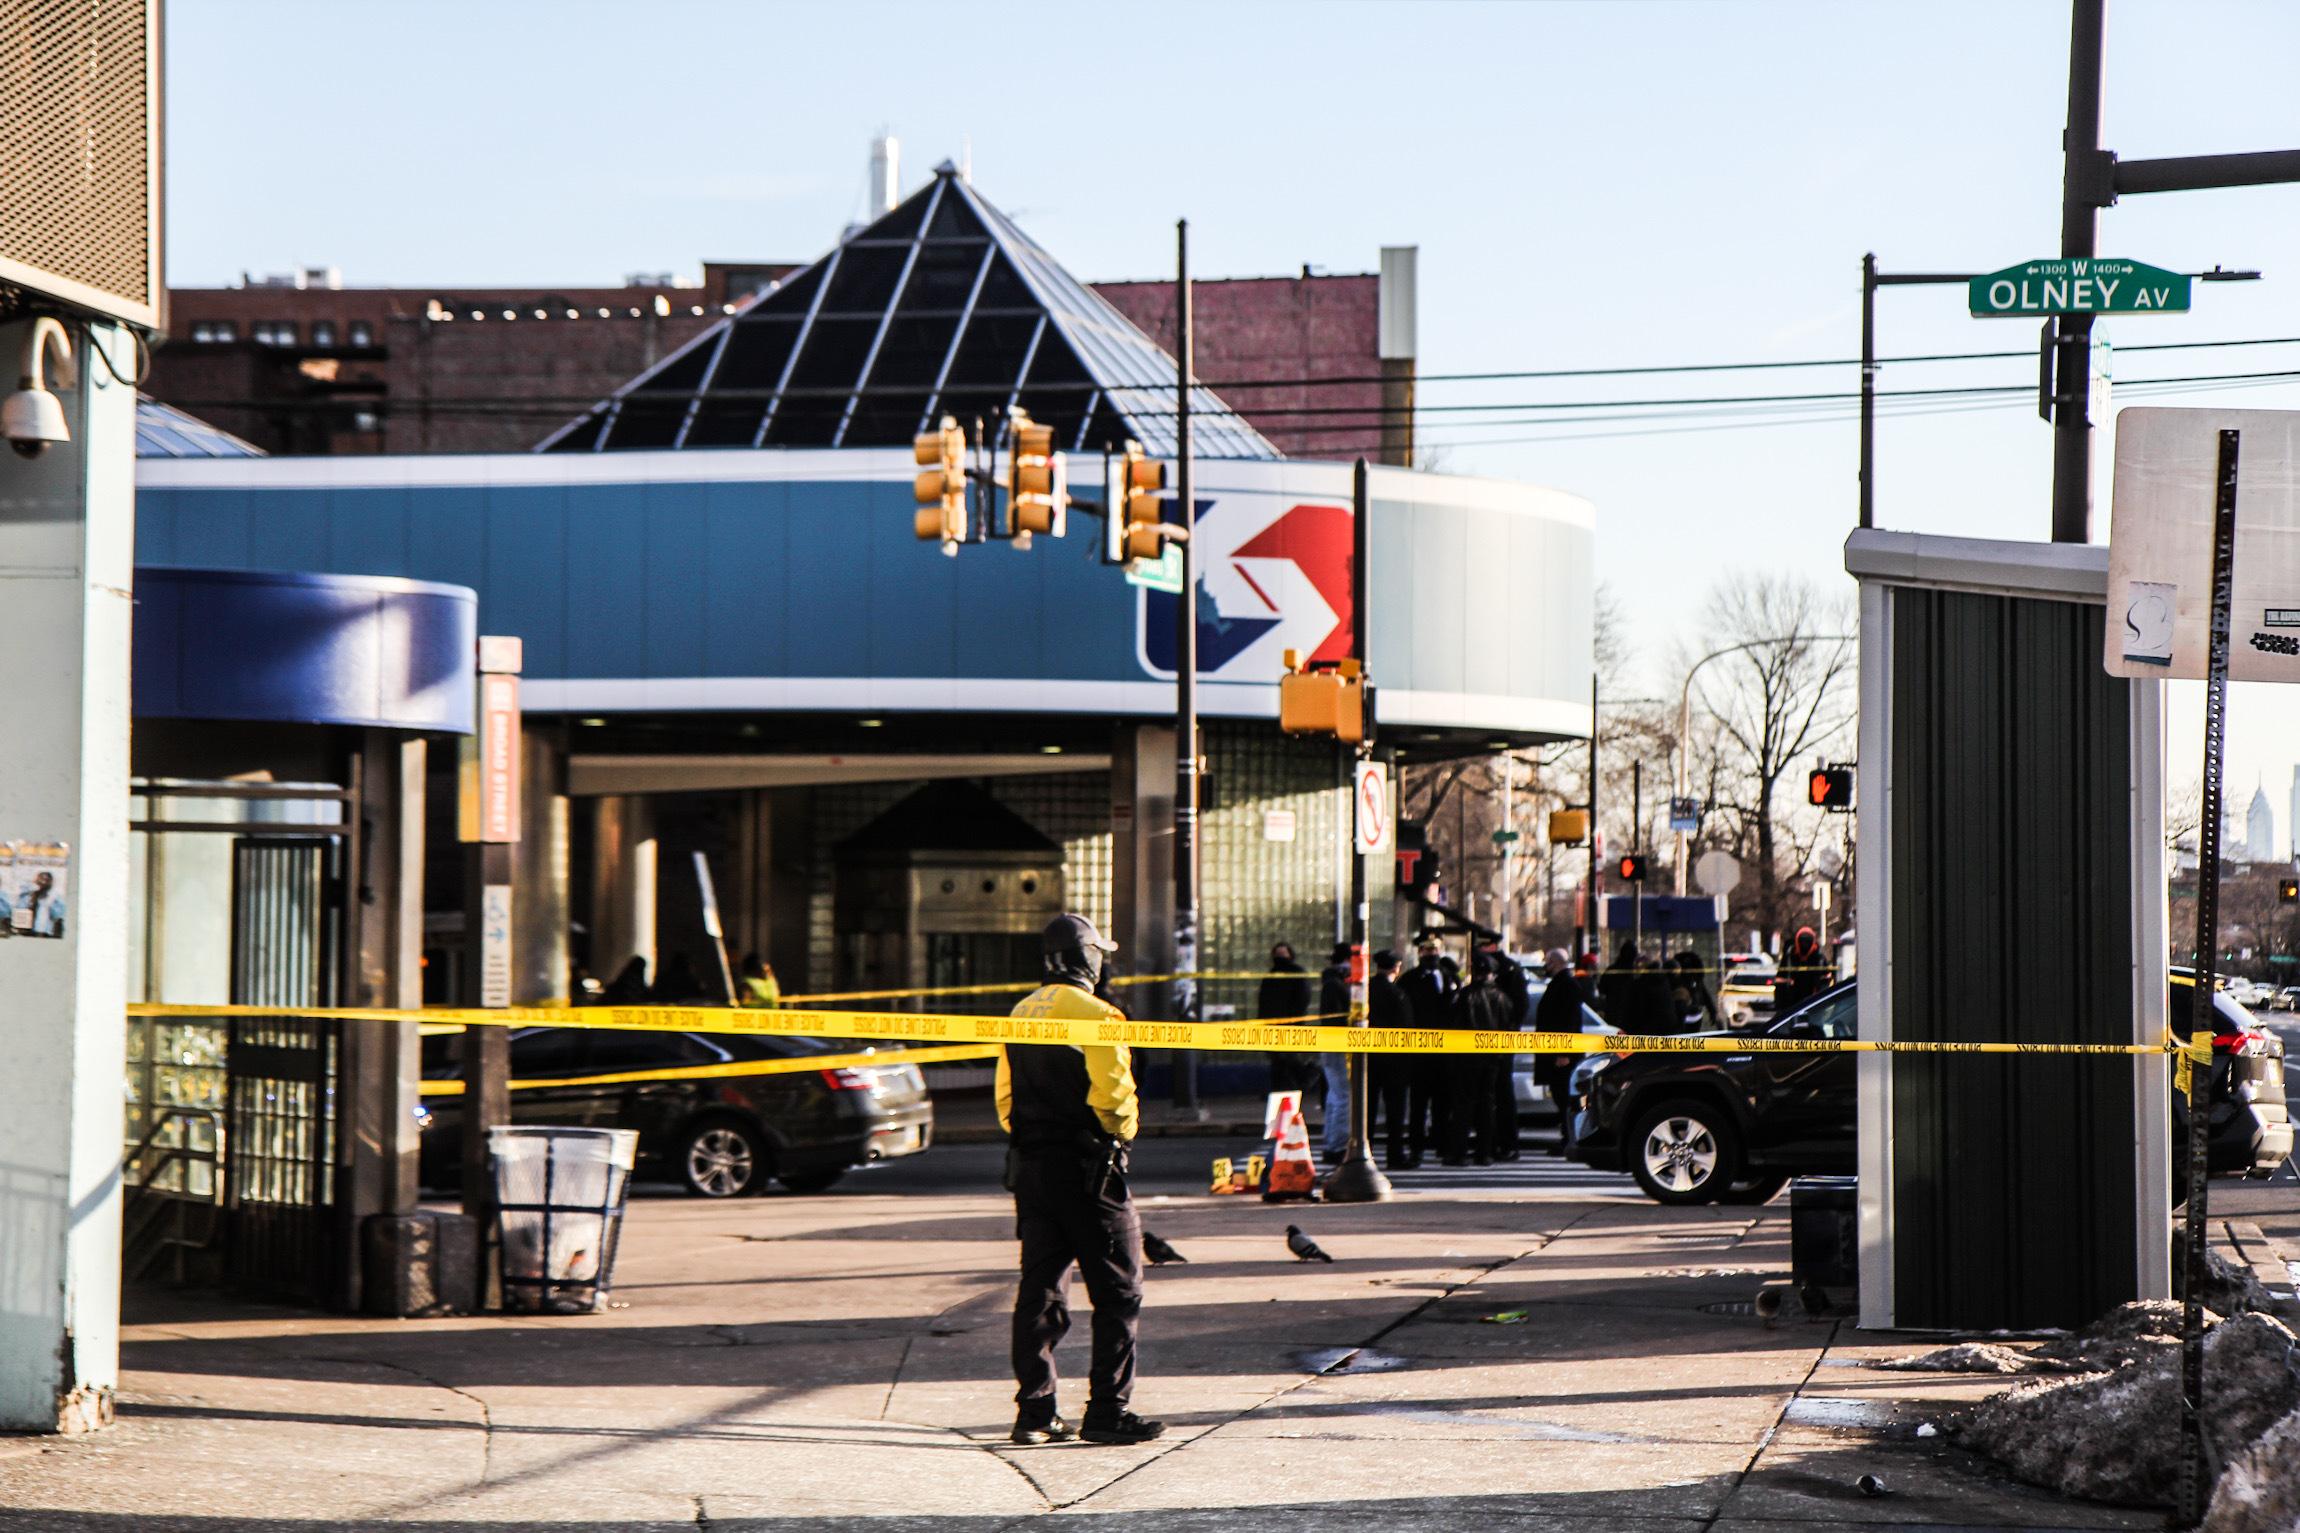 Eight people were shot Feb. 17 at Olney Transportation Center in Philadelphia. (Kimberly Paynter/WHYY)